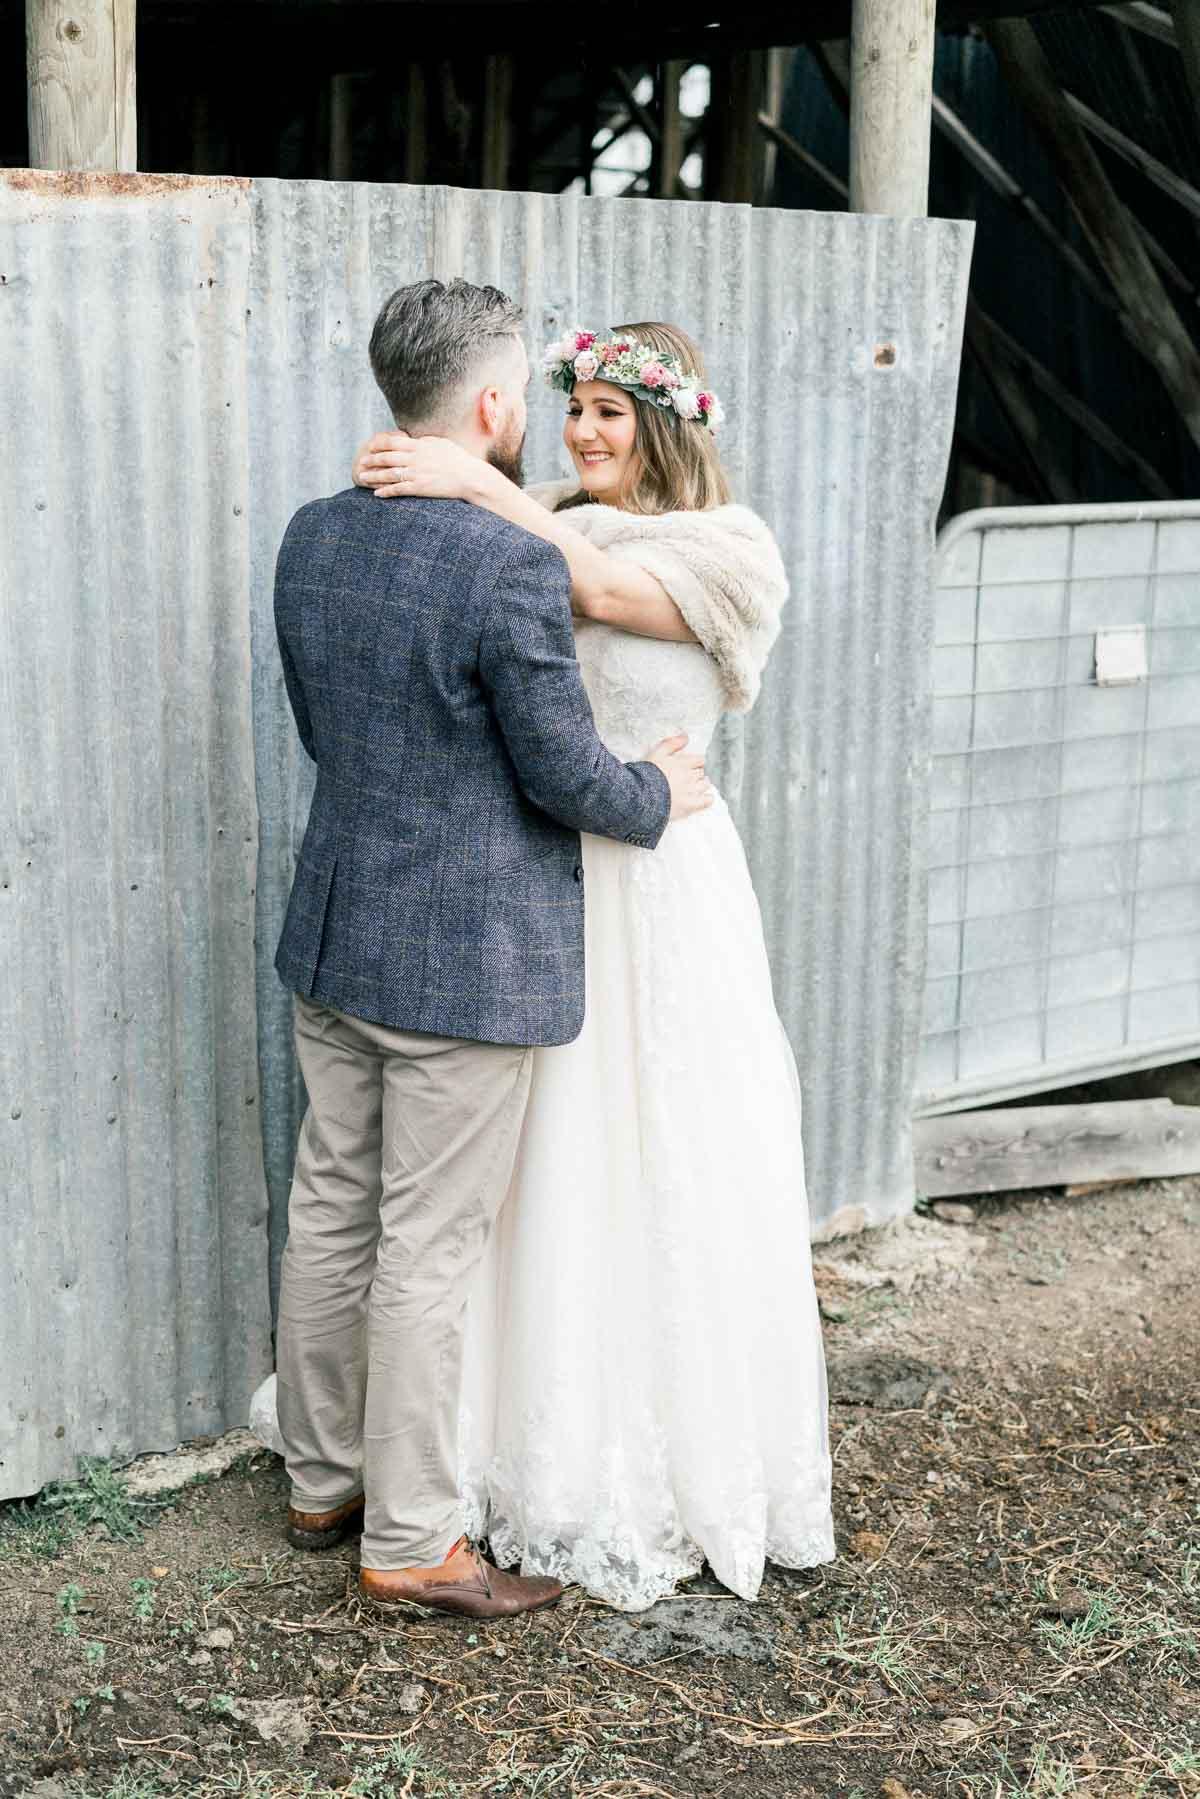 adams-farm-coldstream-yarra-valley-wedding-heart+soul-weddings-kel-jarryd-05788.jpg